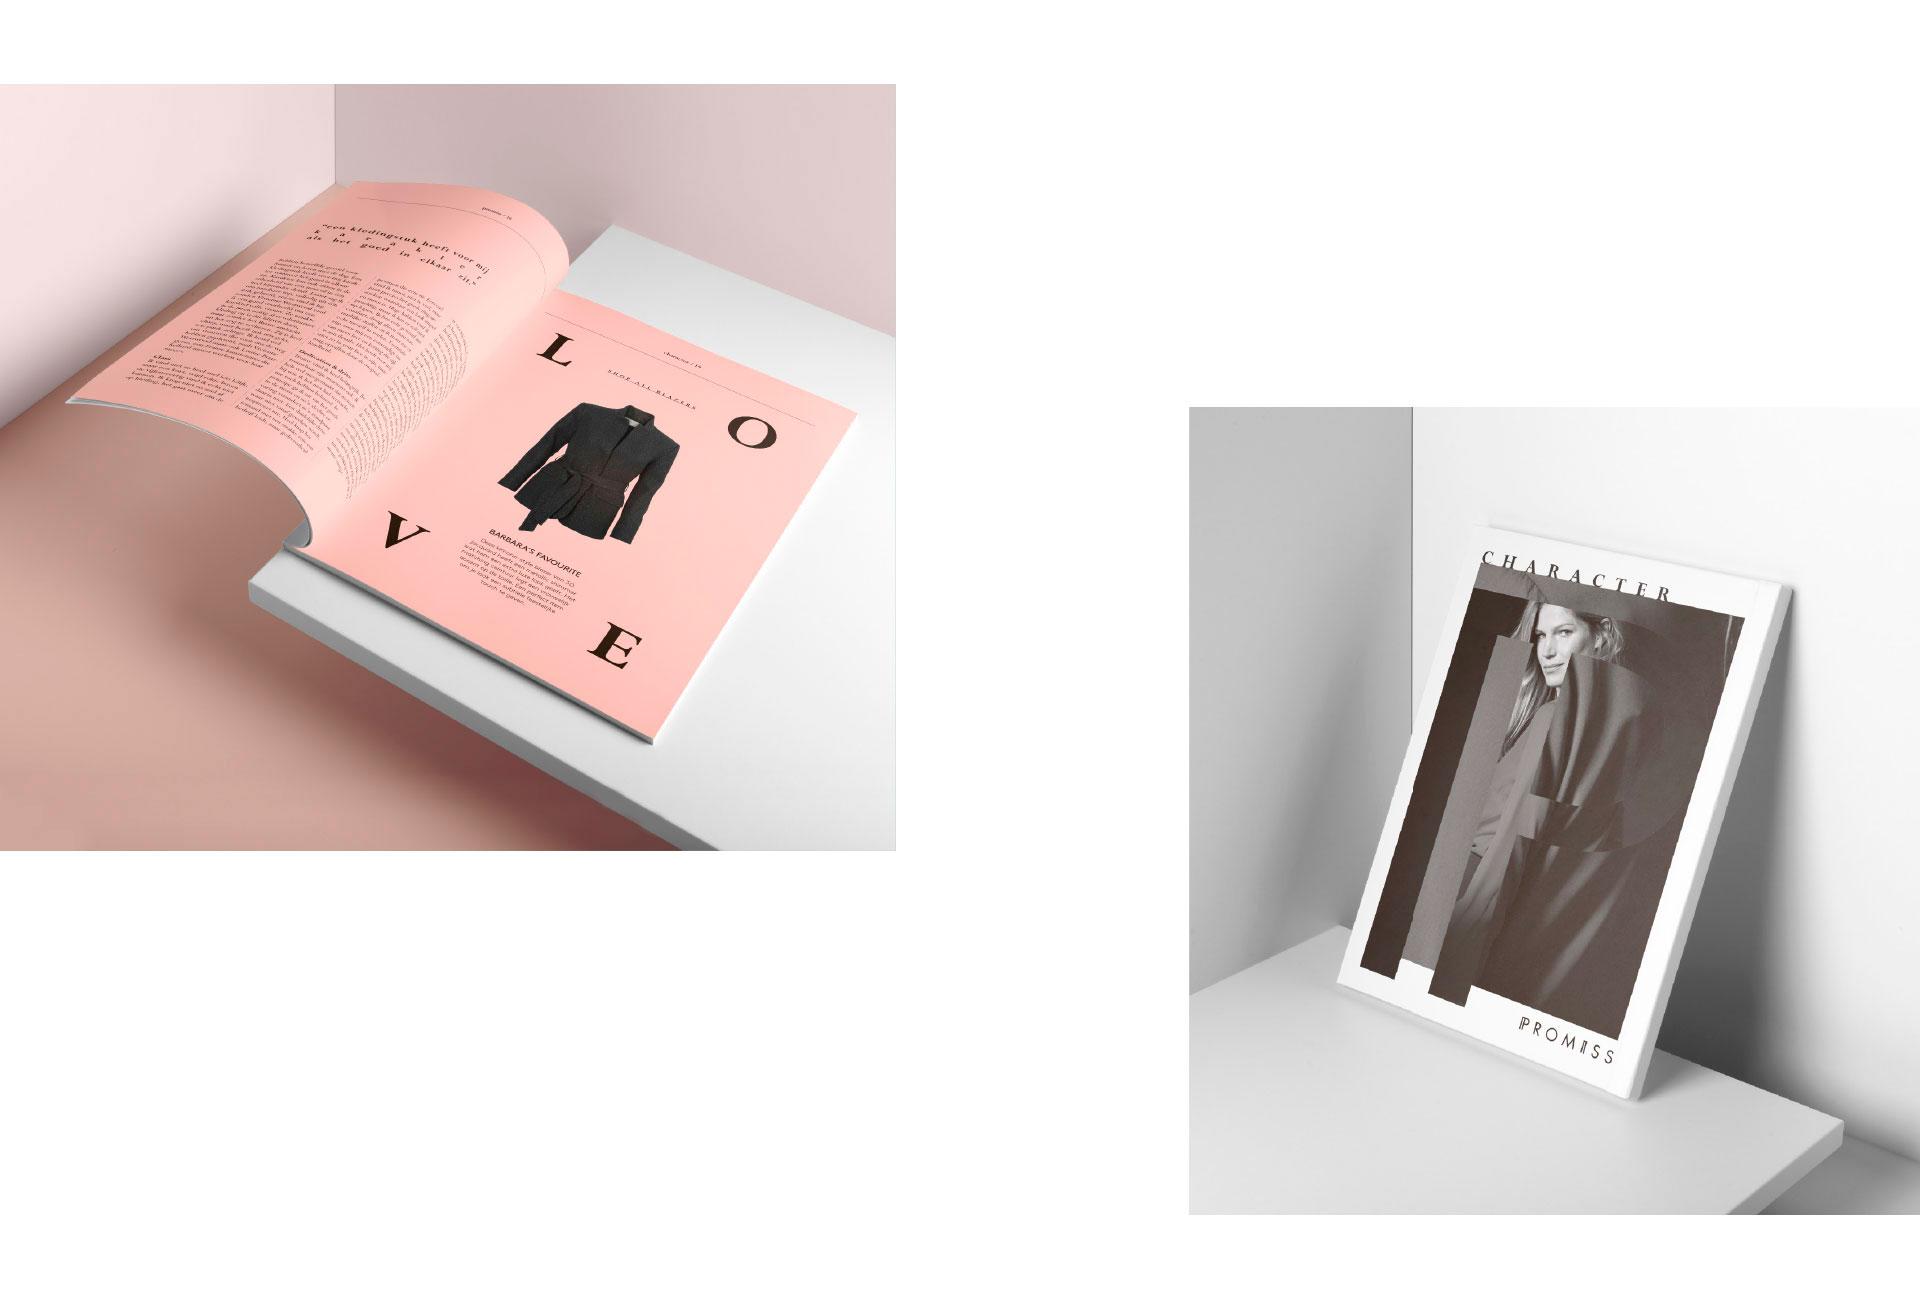 2branding_magazine_design_promiss_7